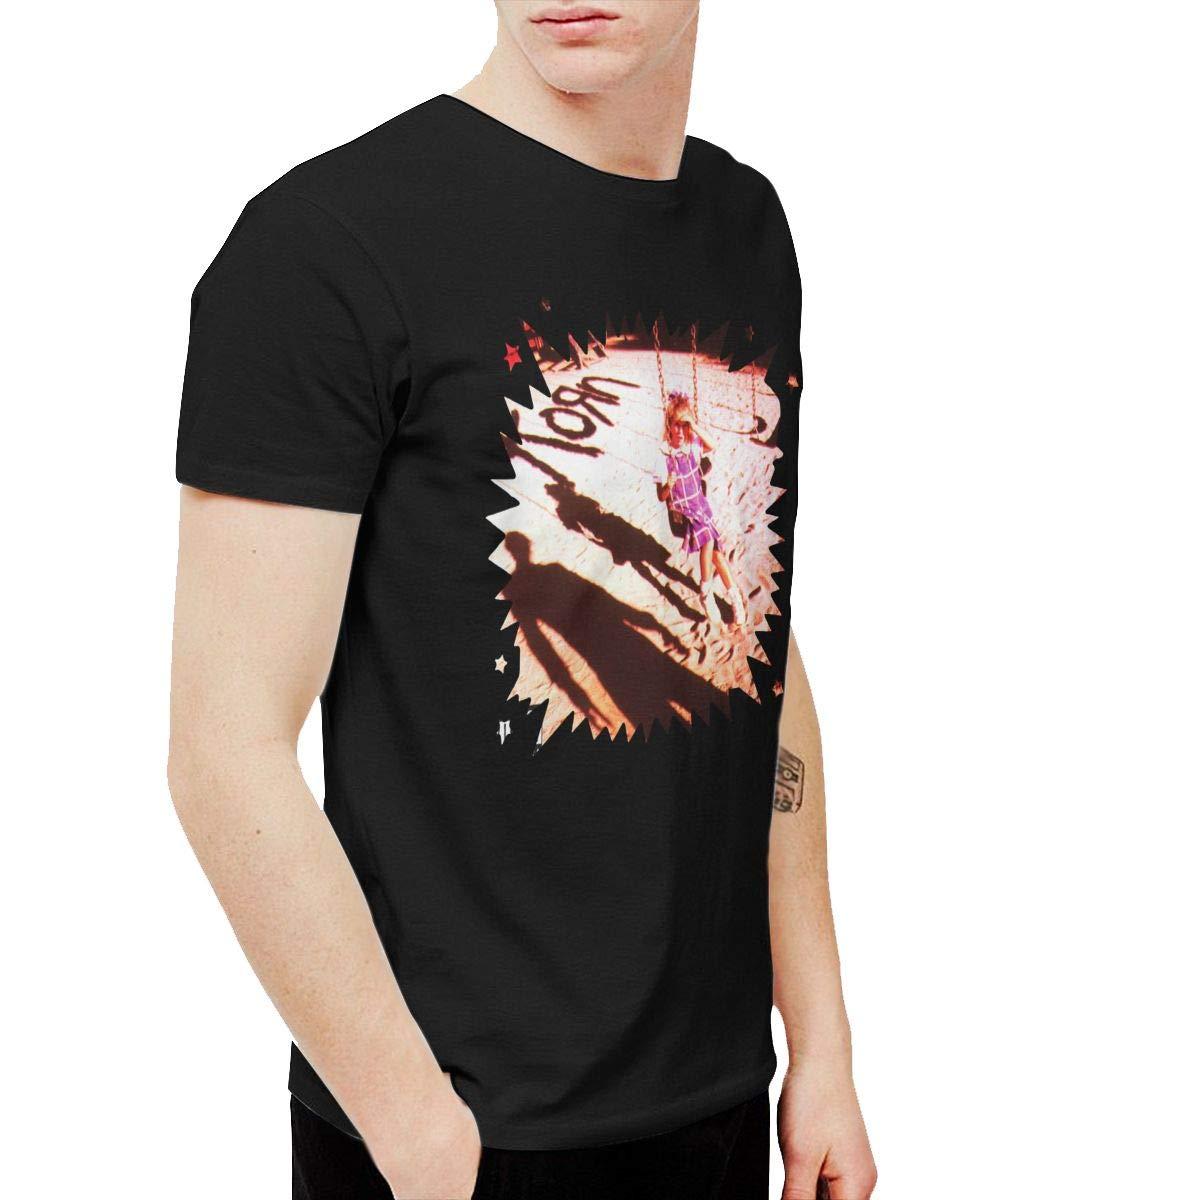 Korn Korn S Tshirts Black